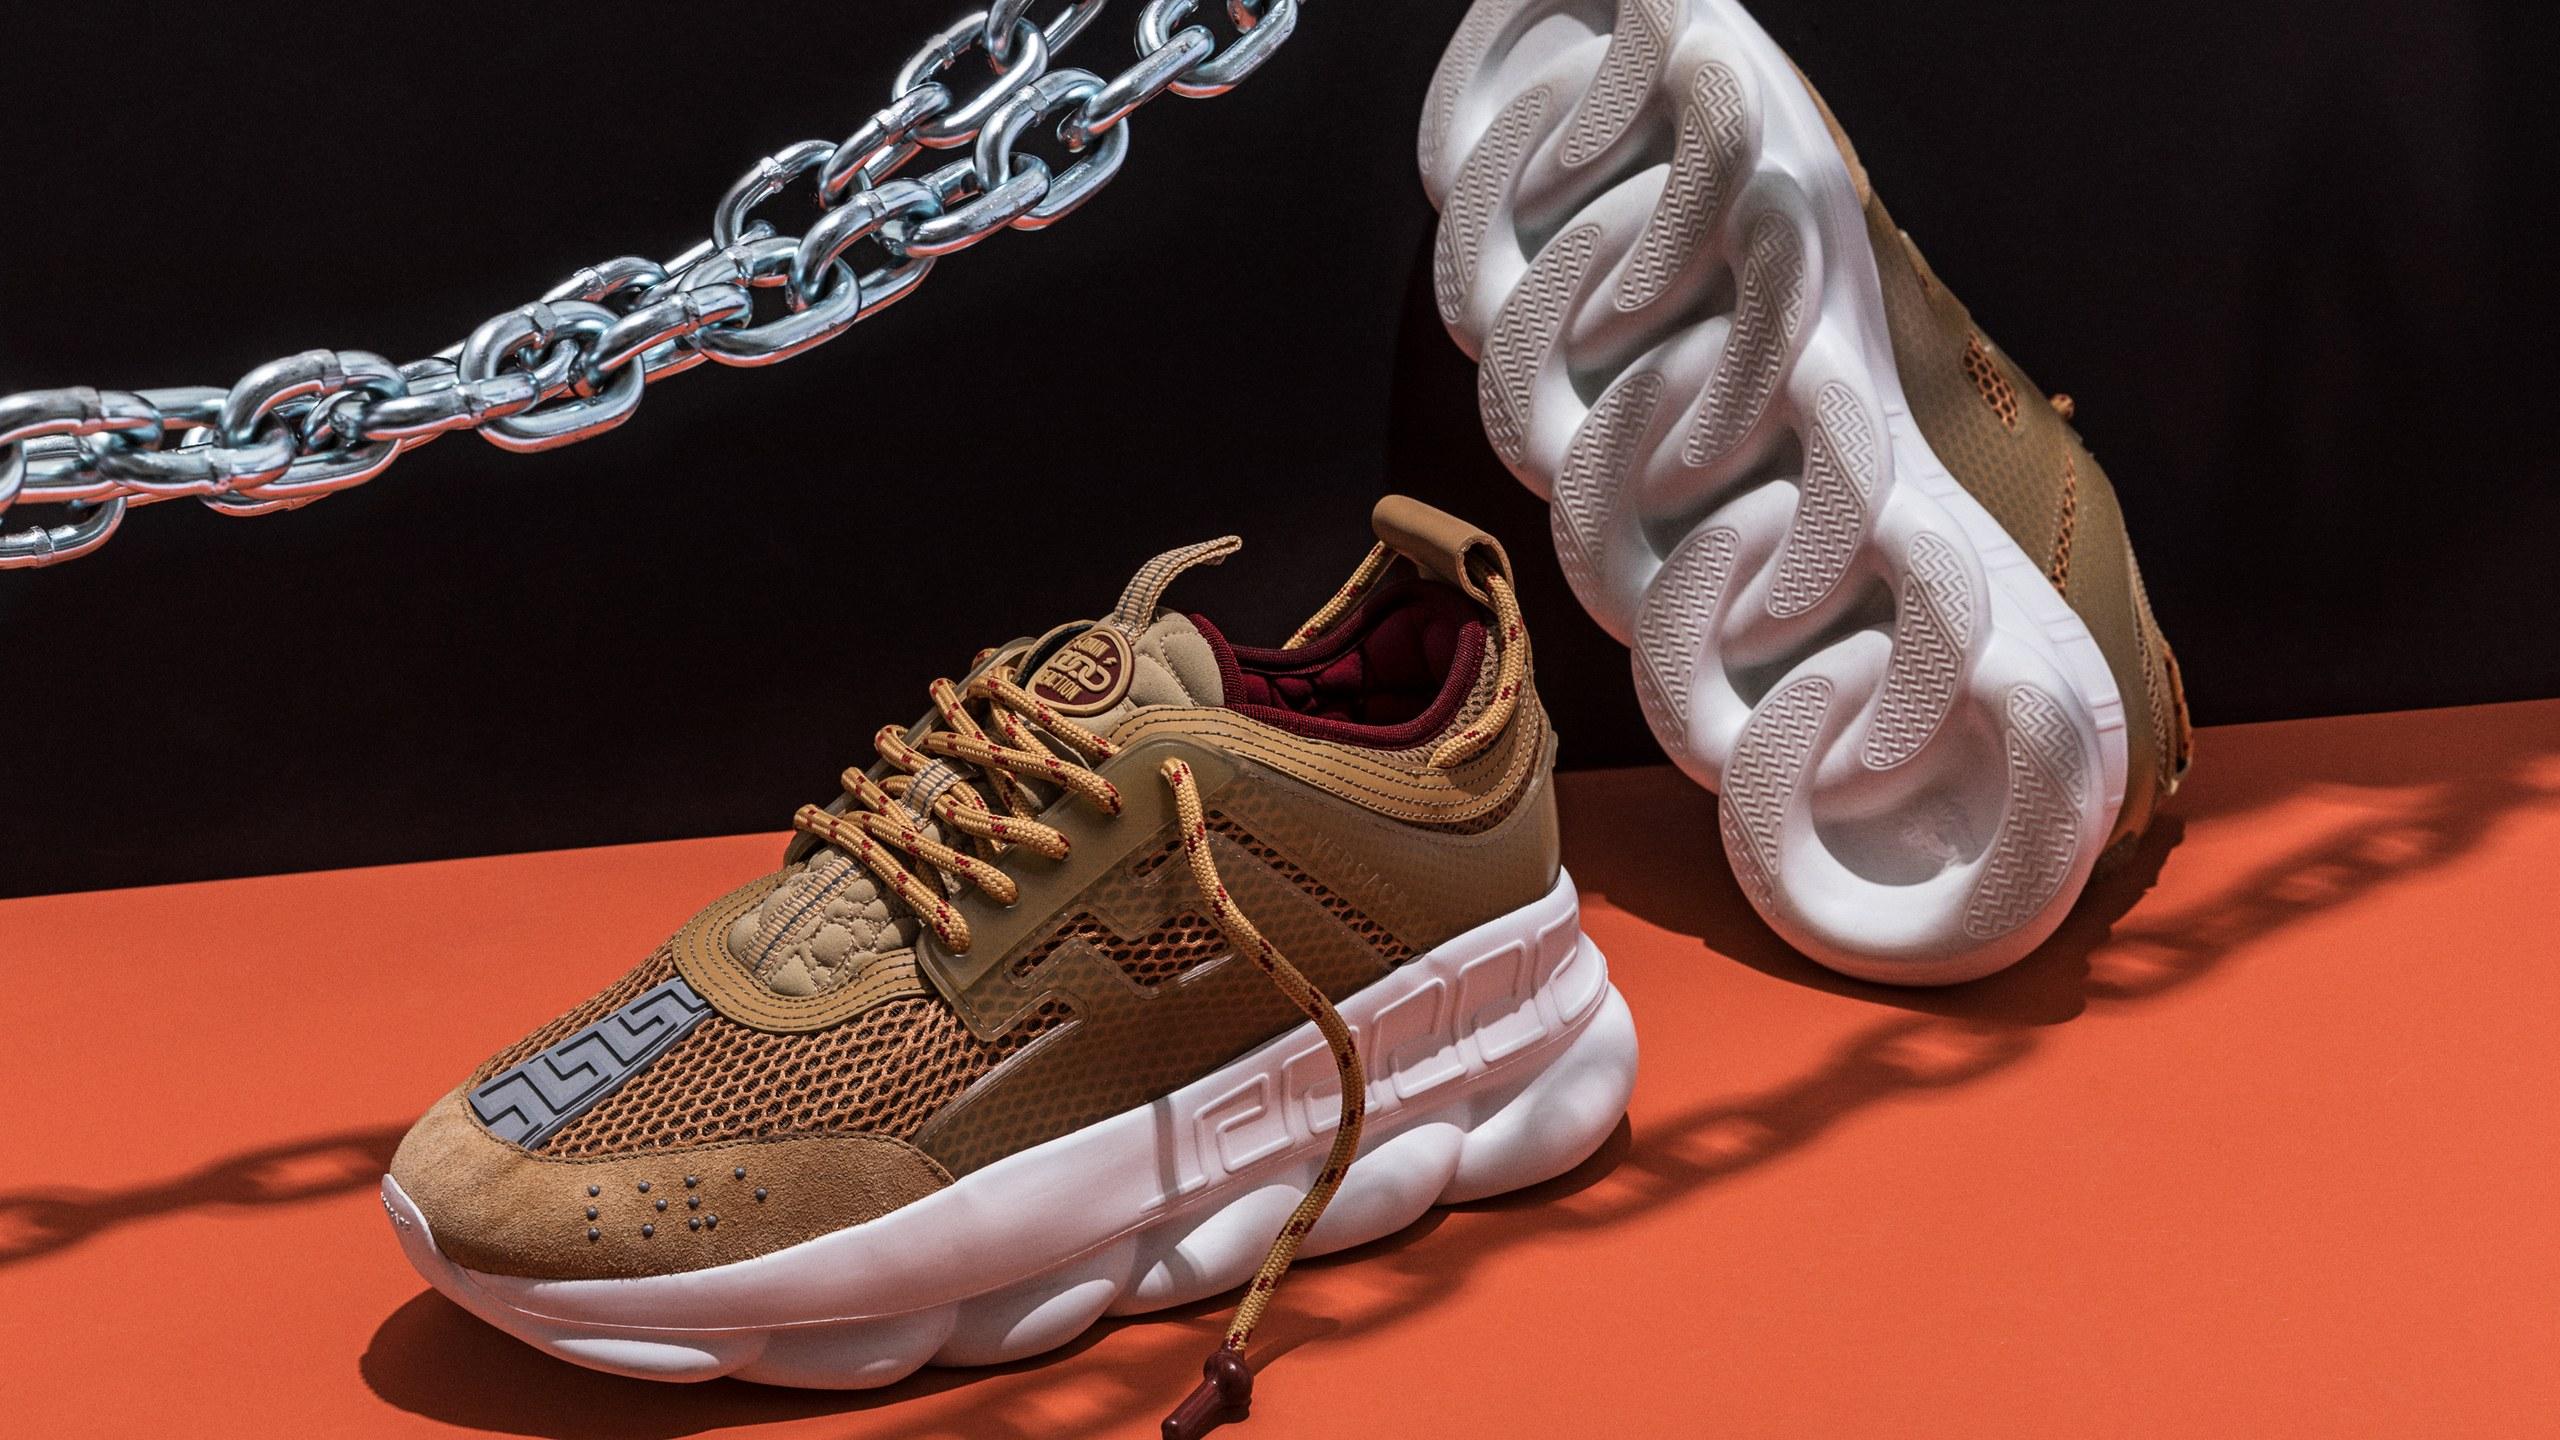 versace-chain-sneakers-02